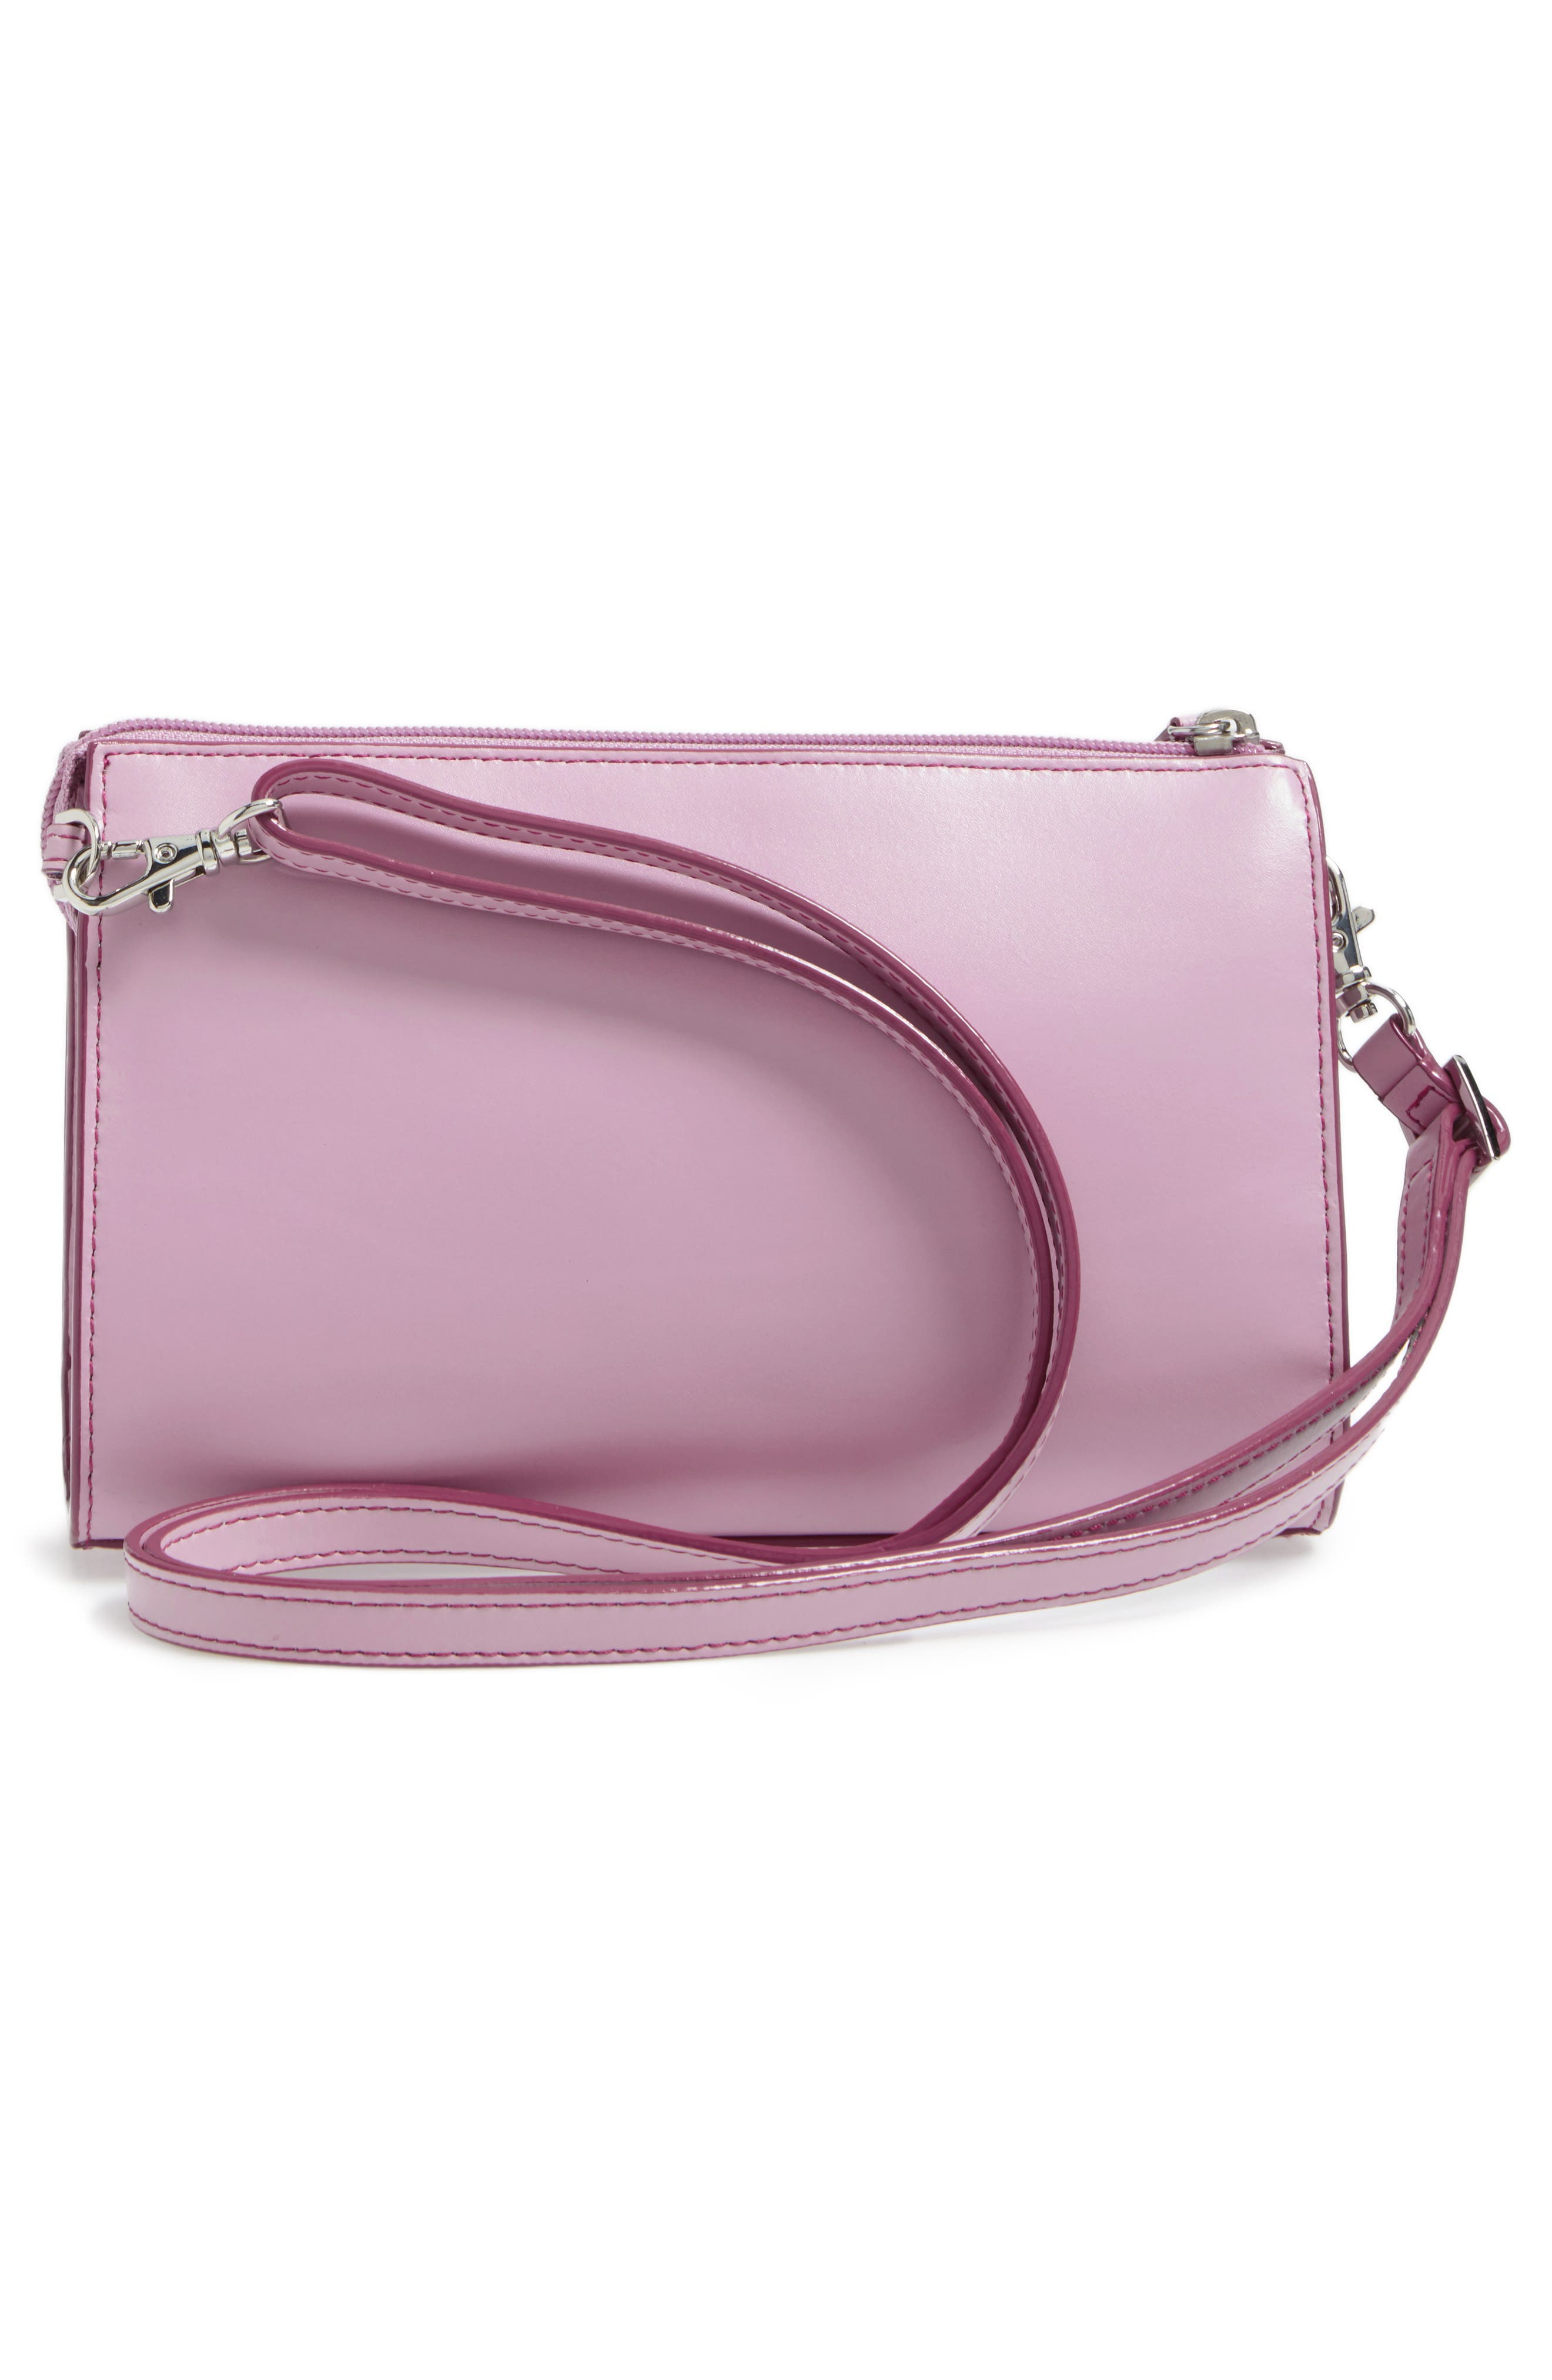 Lodis'Audrey Collection -Vicky' ConvertibleCrossbody Bag,                             Alternate thumbnail 21, color,